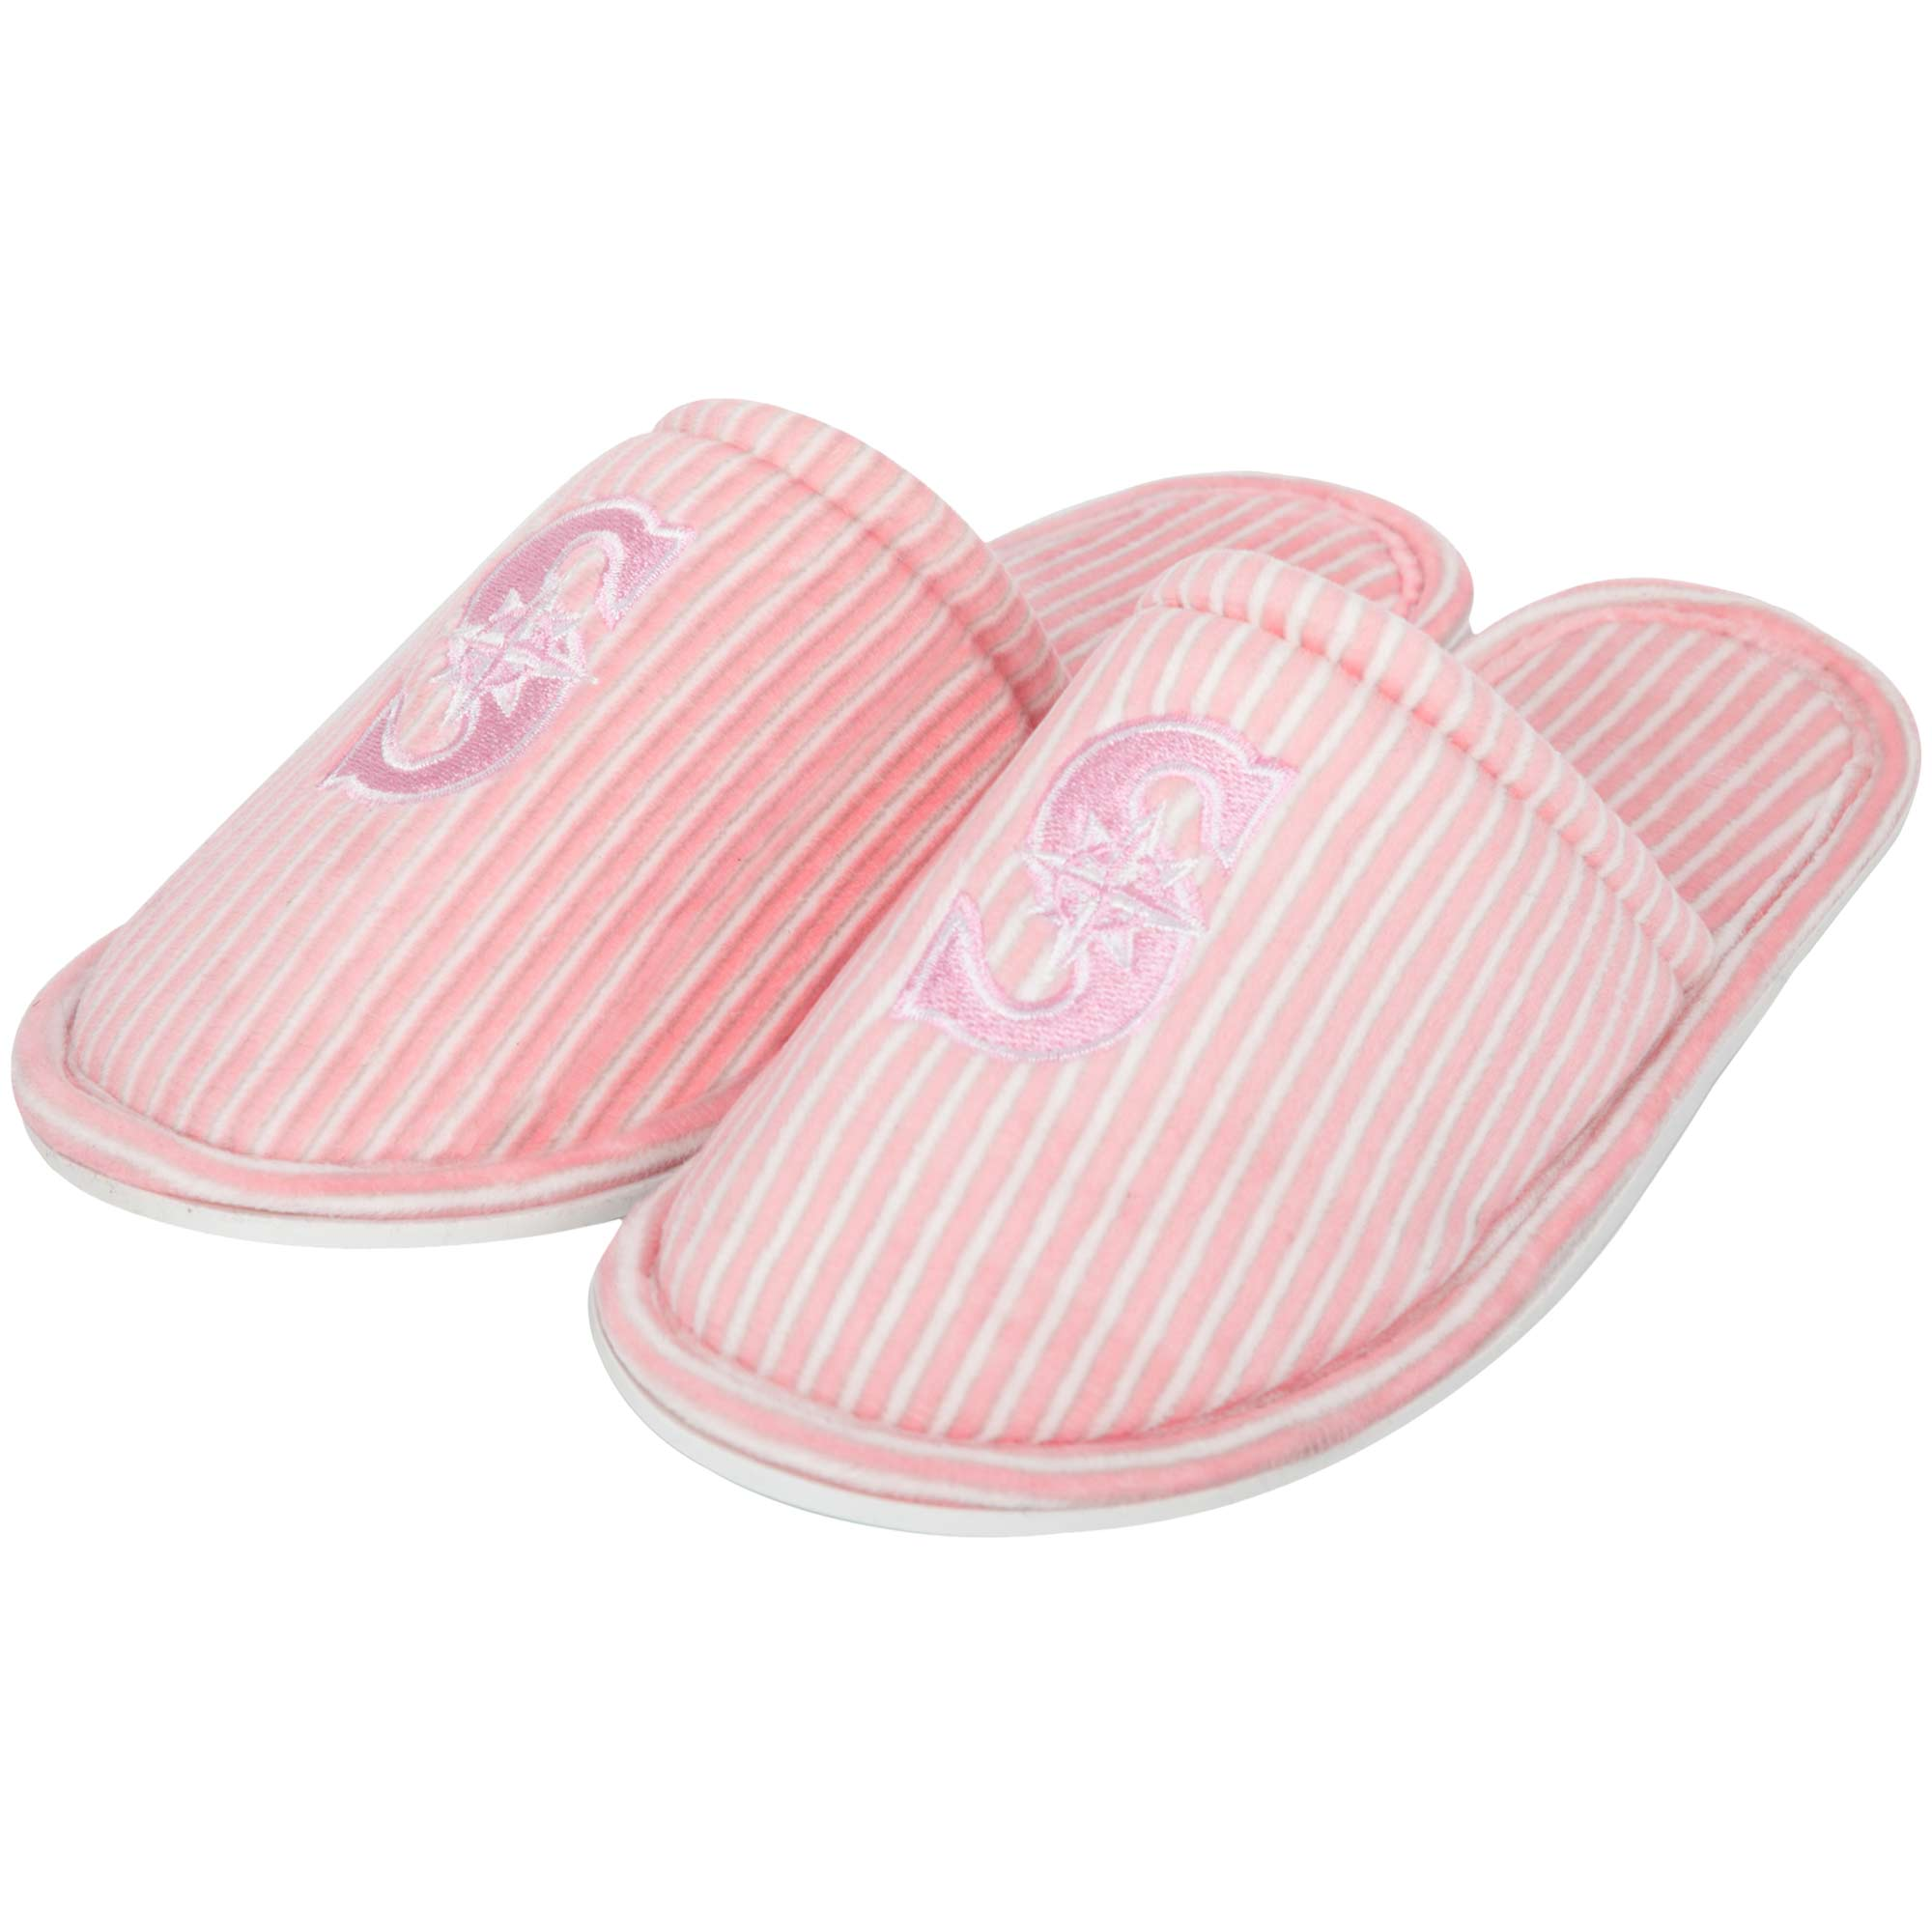 Seattle Mariners Slide Women's Slide Mariners Slipper - Pink 88f3a1